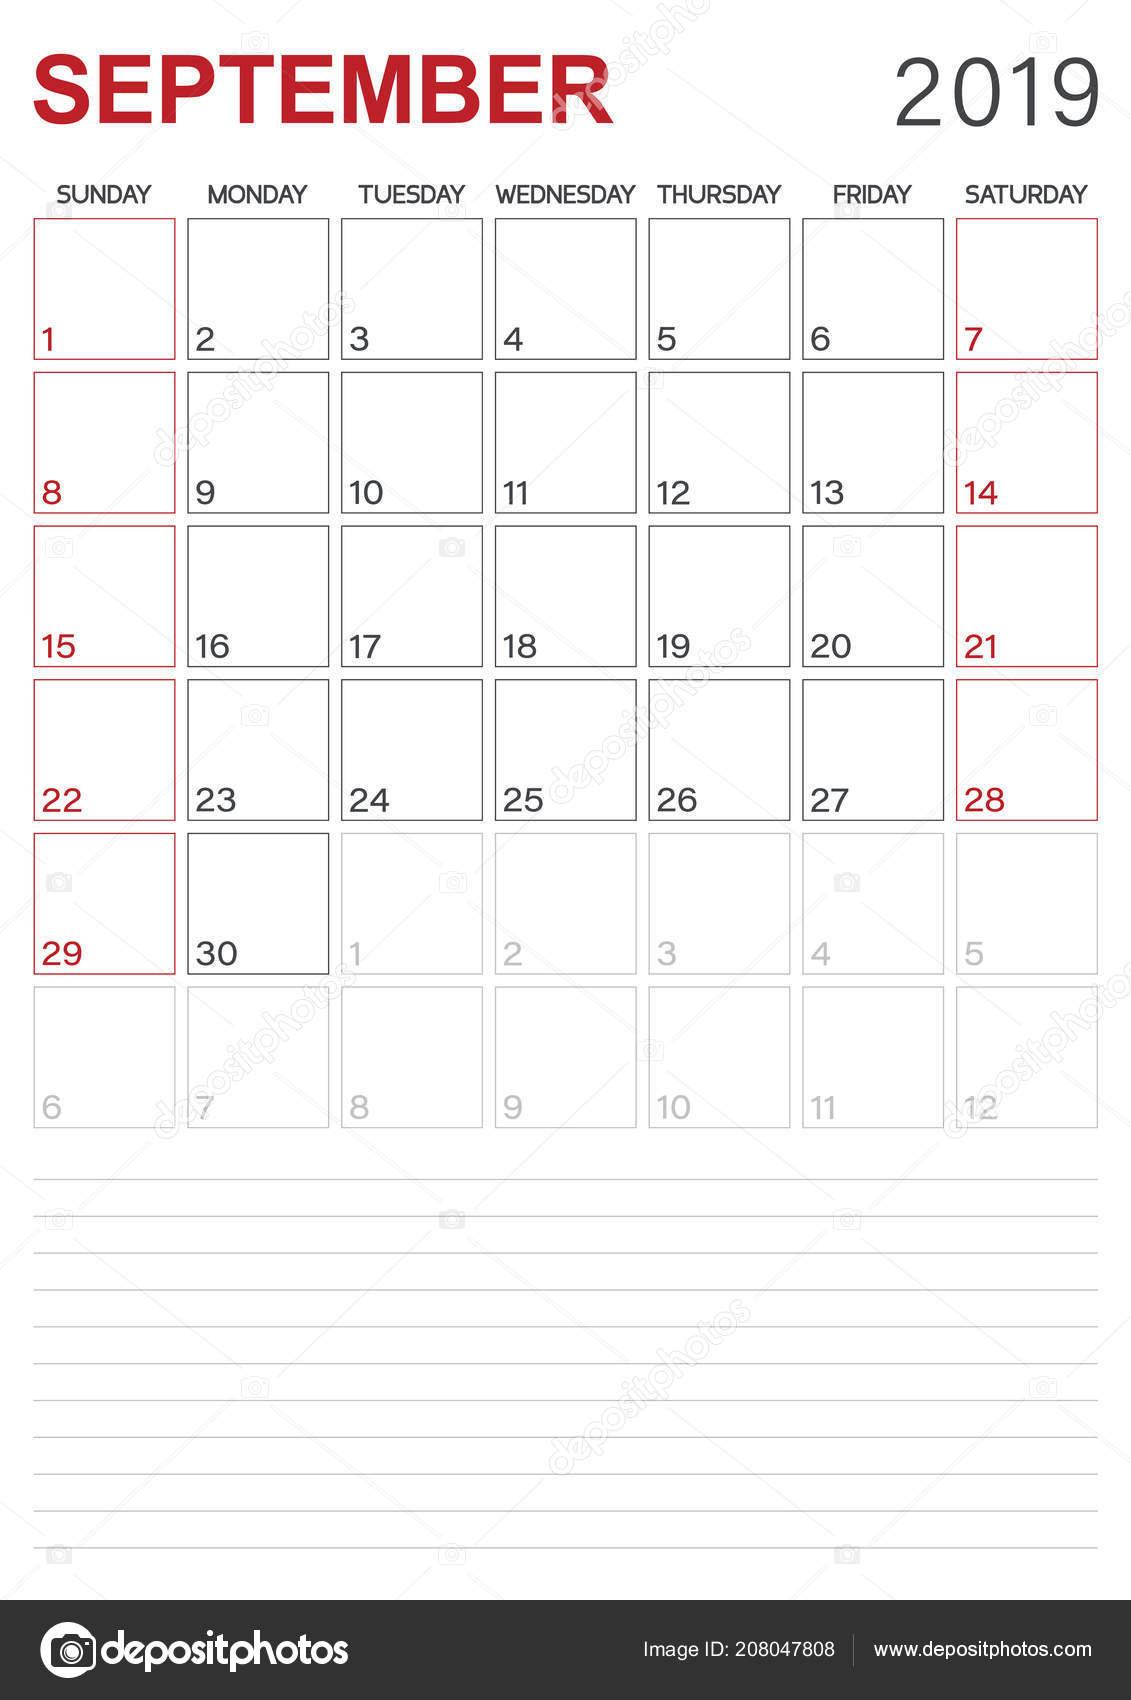 Calendrier Mois De Septembre.Anglais Calendar Calendrier Planificateur 2019 Mois